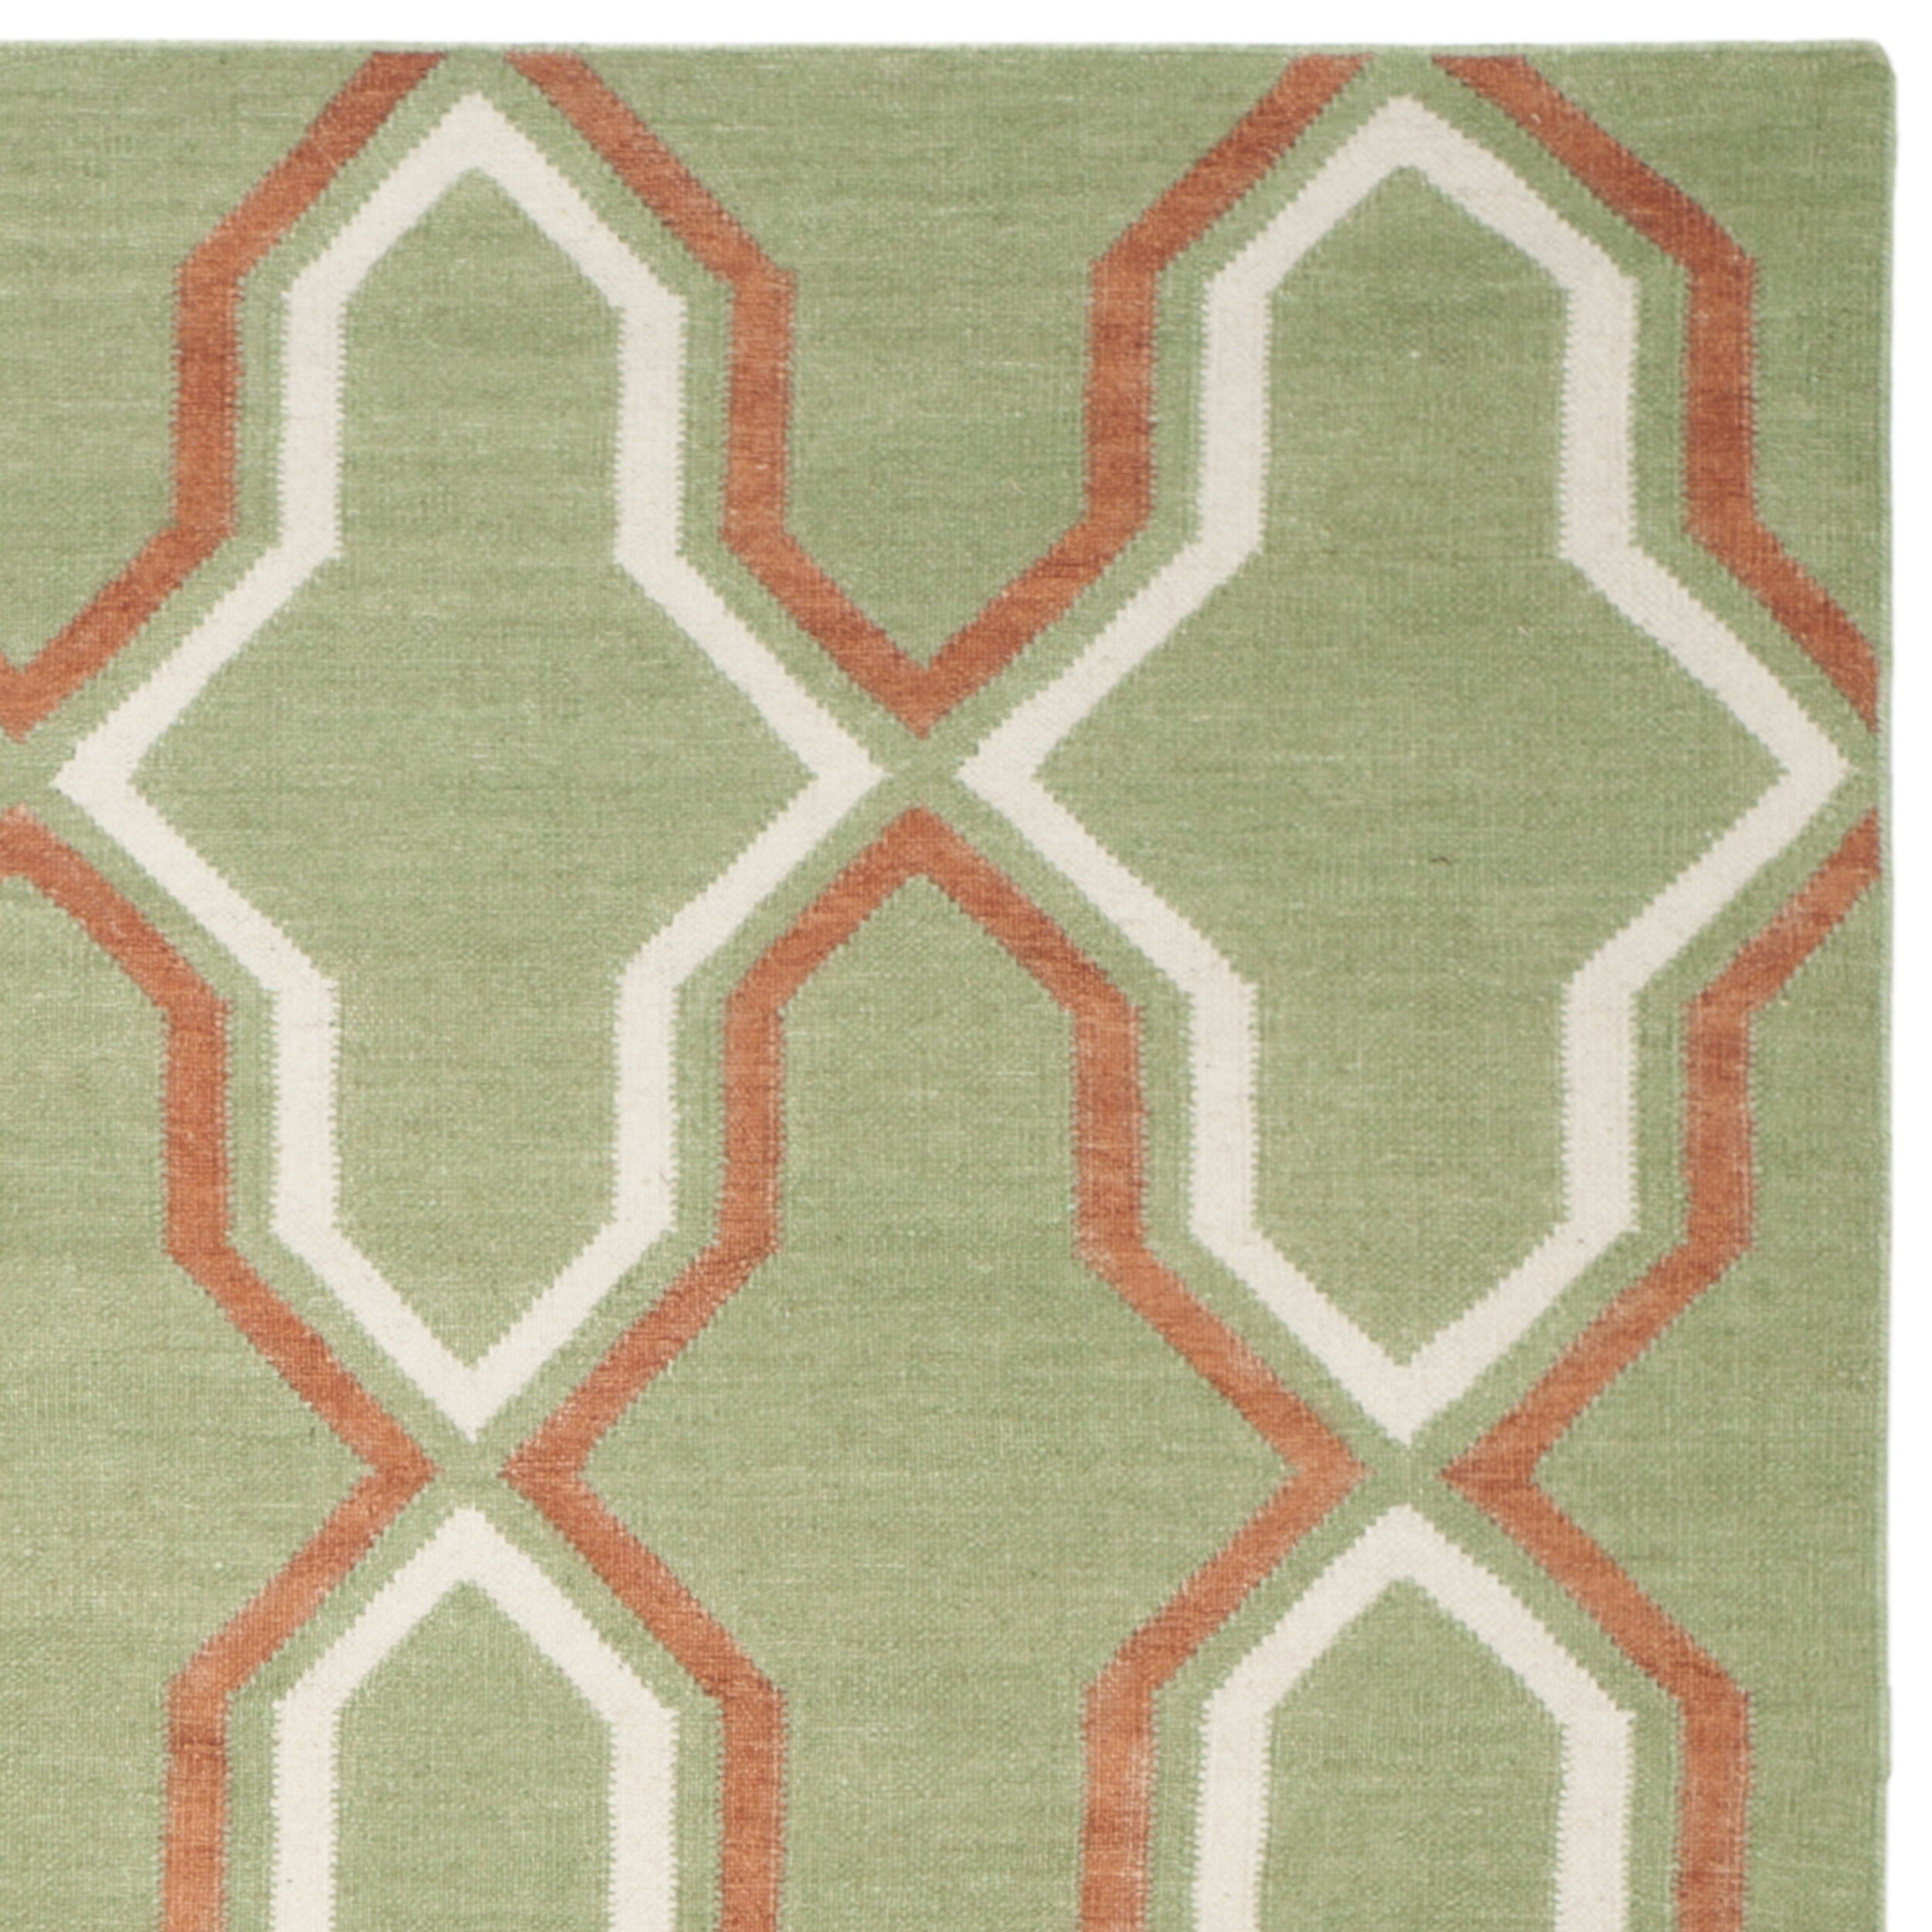 Safavieh Dhurries Green Orange Contemporary Area Rug